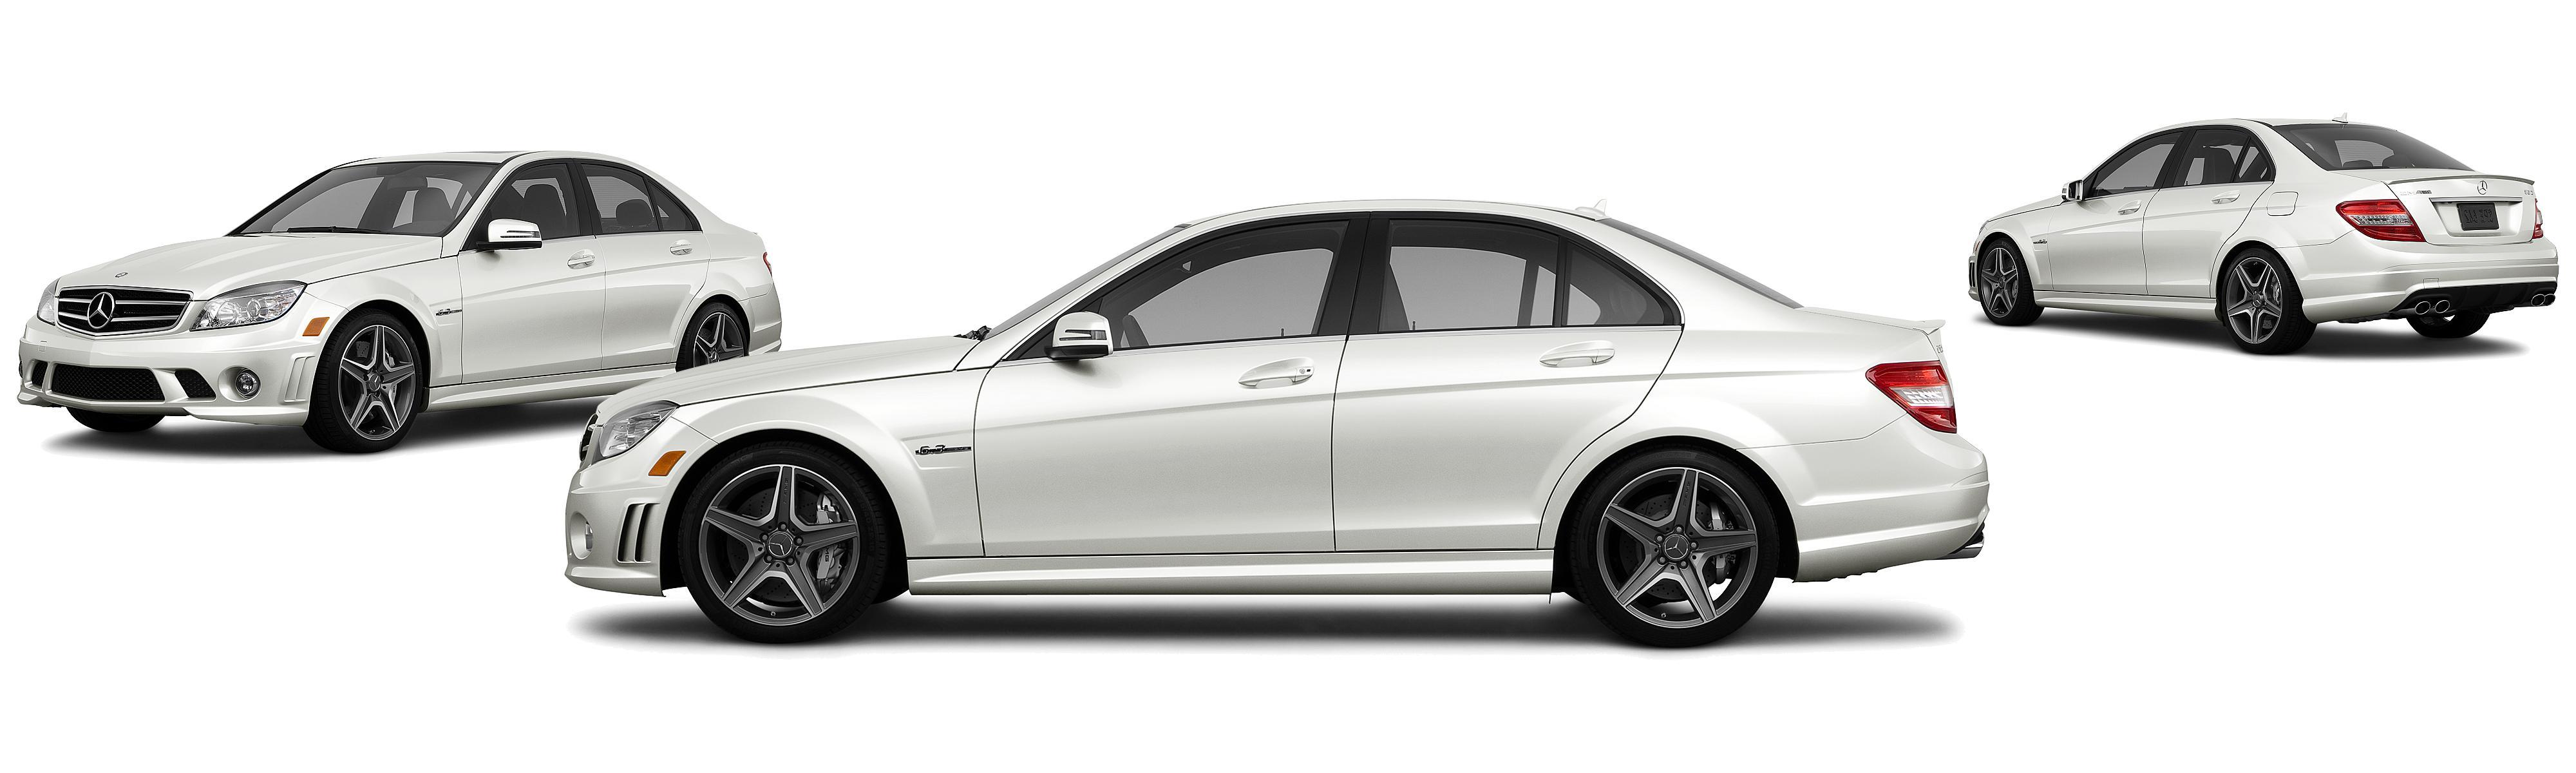 2011 Mercedes Benz C Class C 63 AMG 4dr Sedan Research GrooveCar